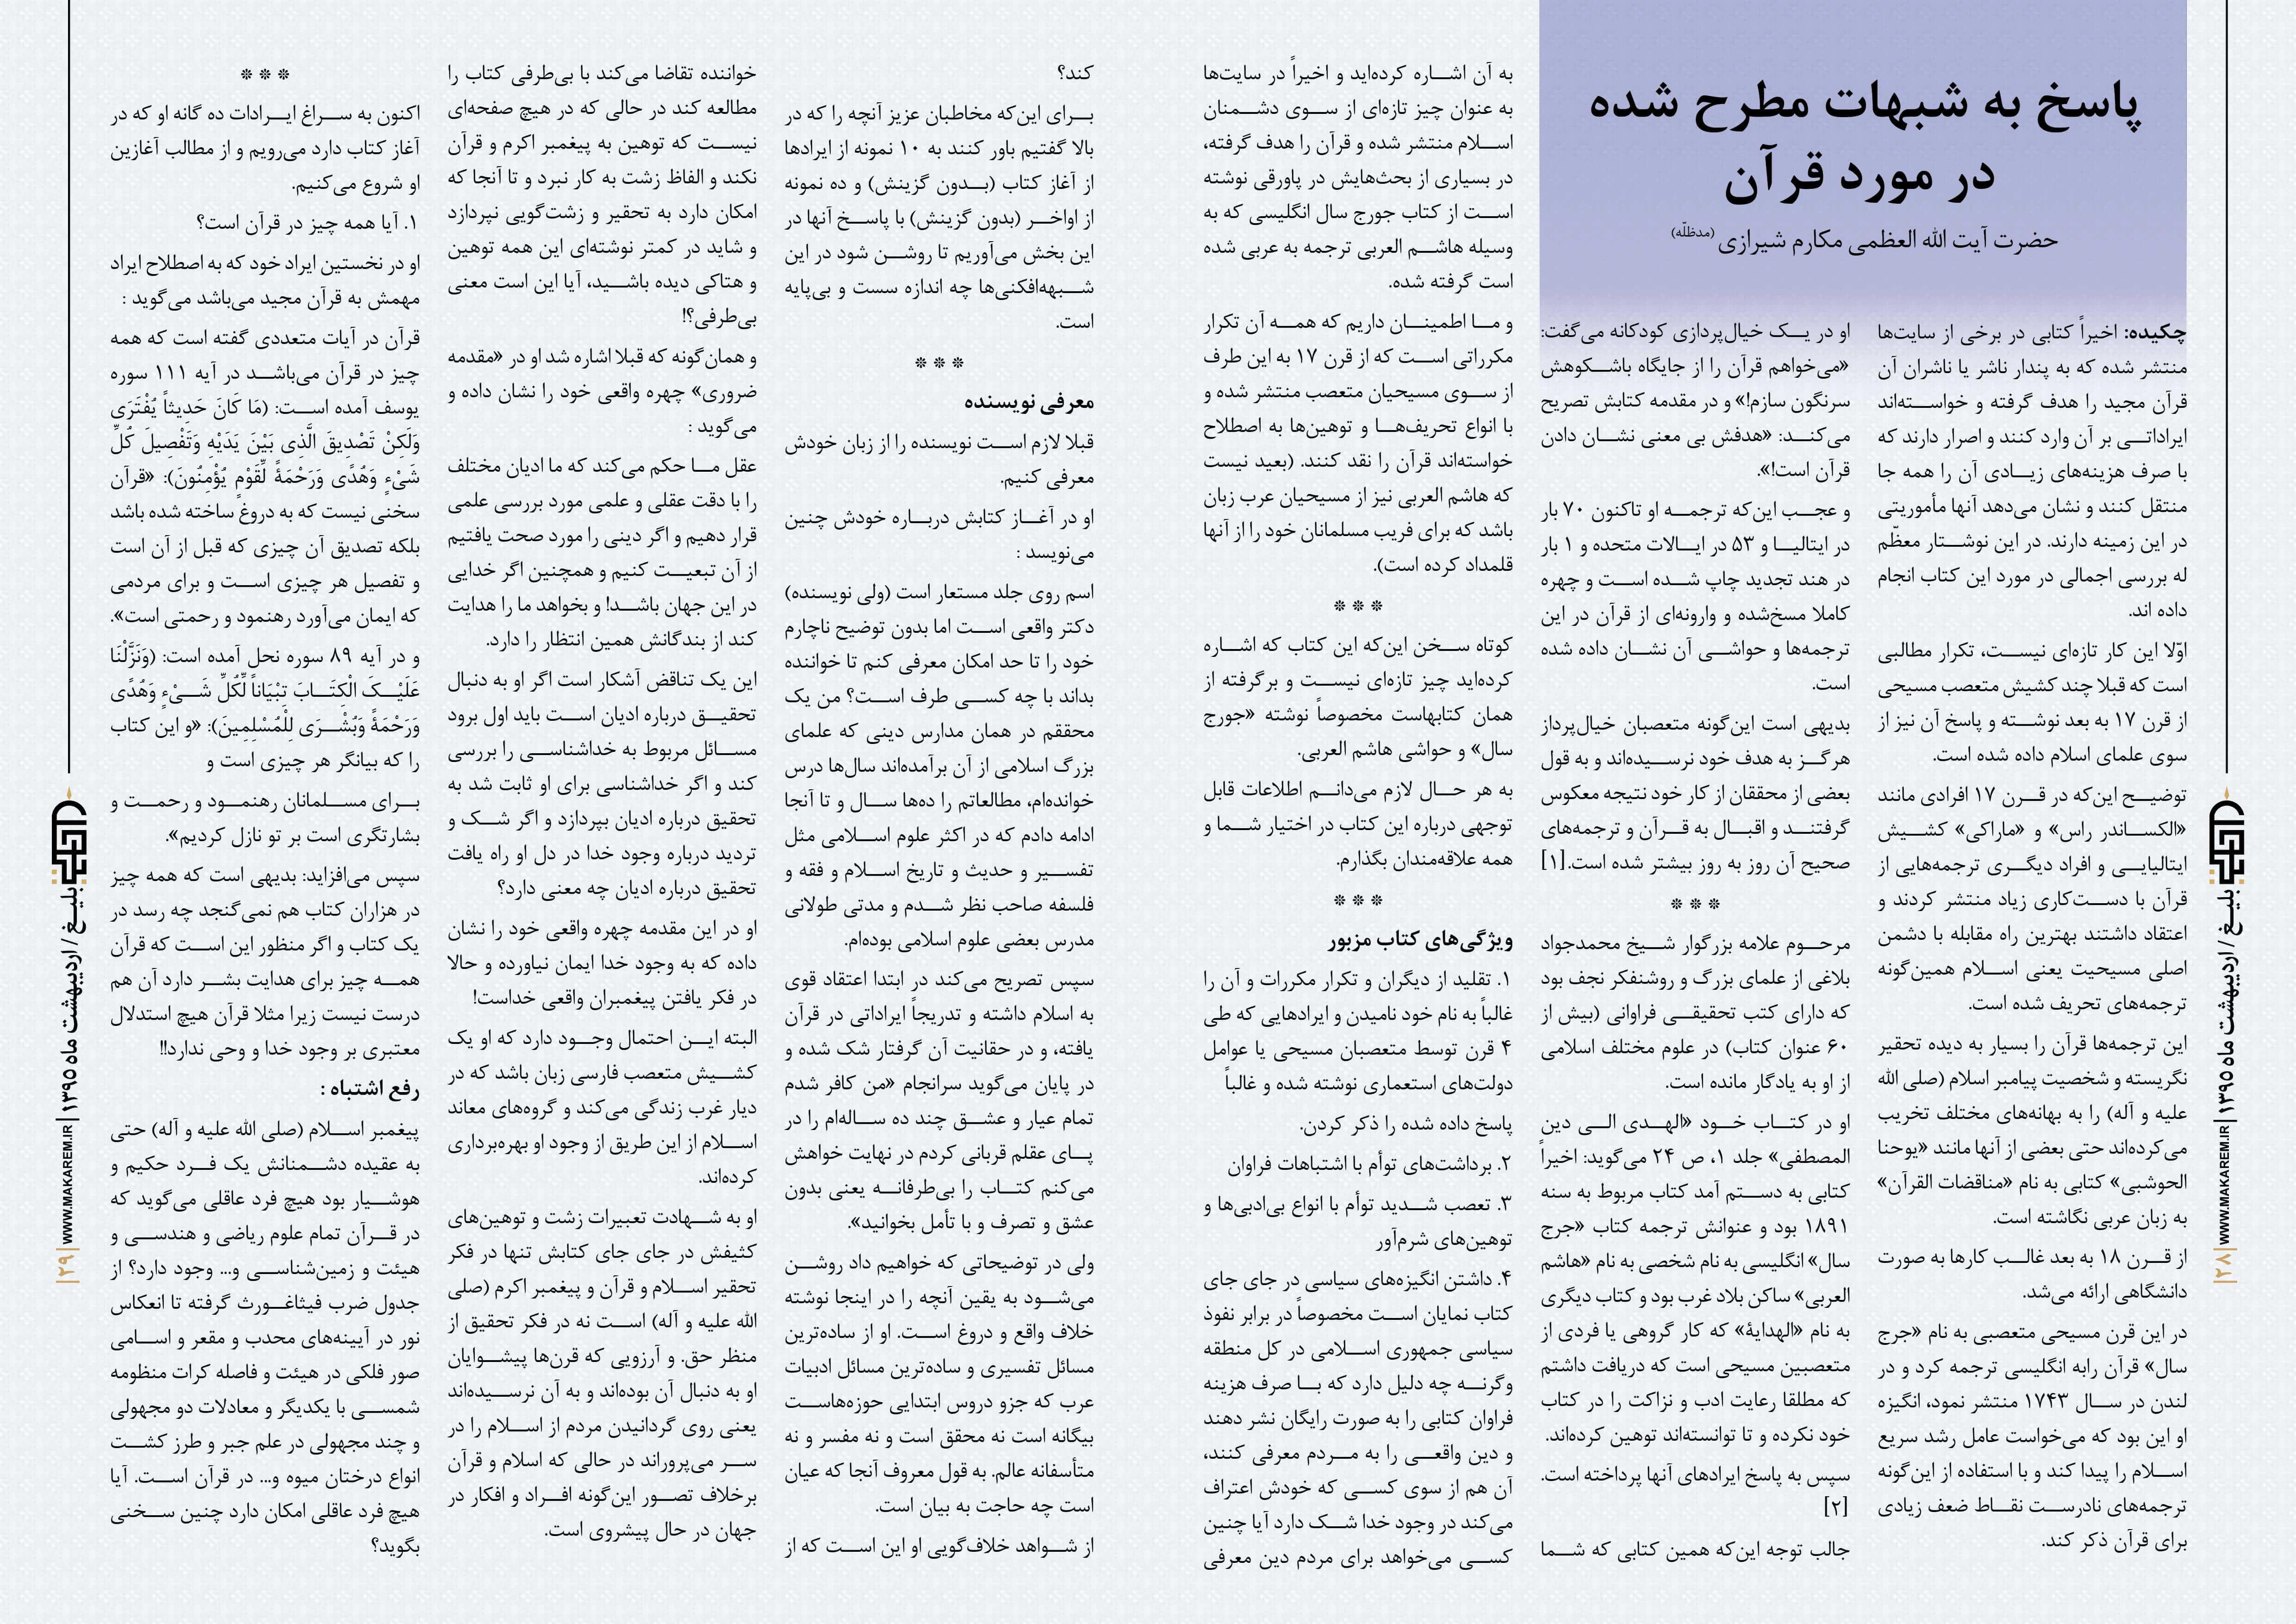 15-مدرسه الامام امیر المومنین (ع)